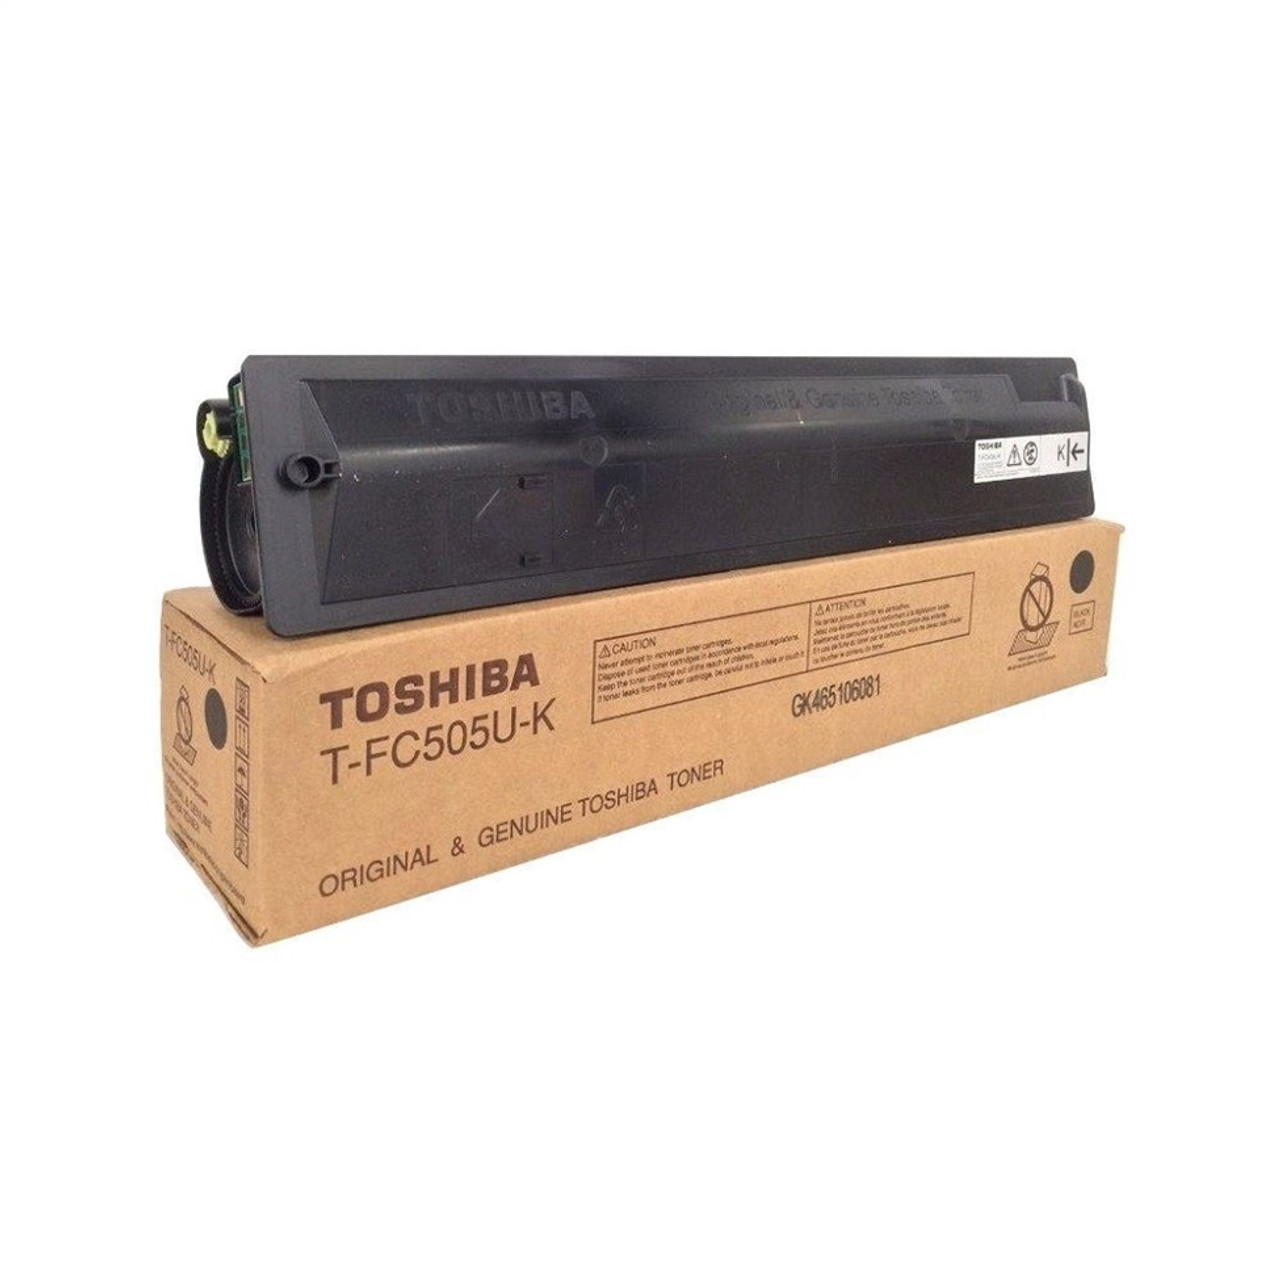 Genuine Toshiba T-FC50U-K Black Toner Cartridge